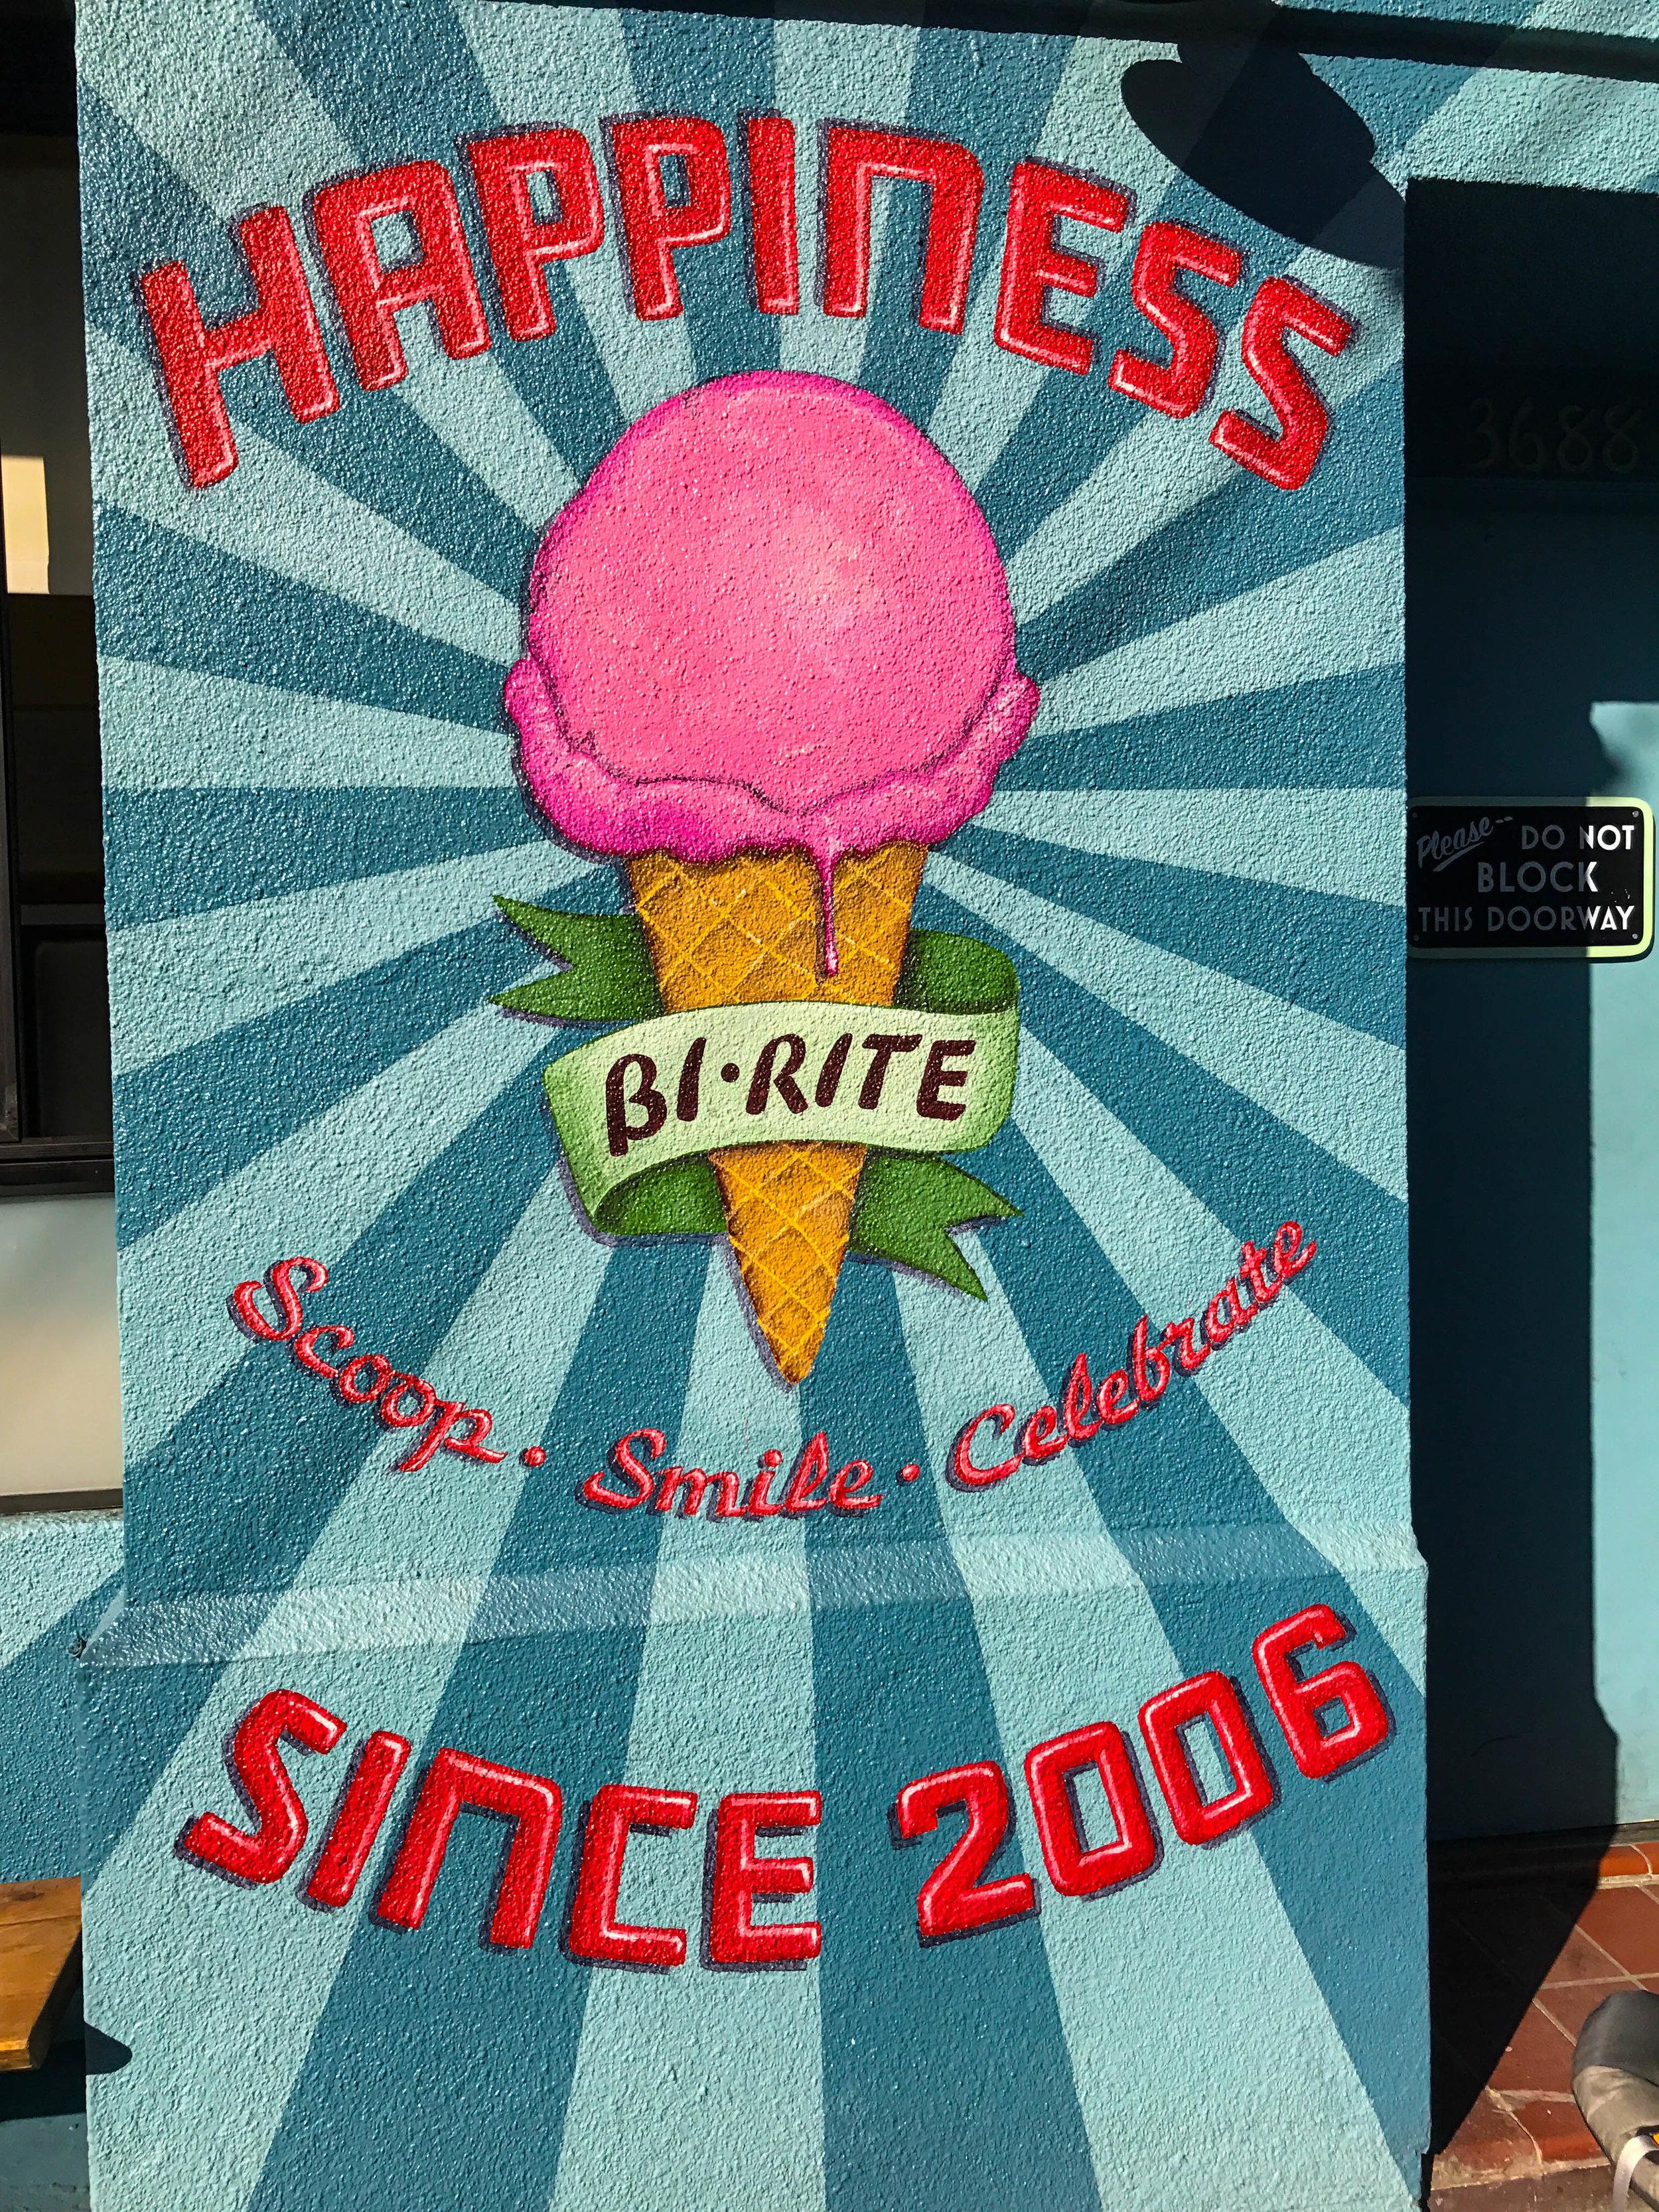 Bi-Rite Ice Cream Review - Happiness, Scoop, Smile, Celebrate